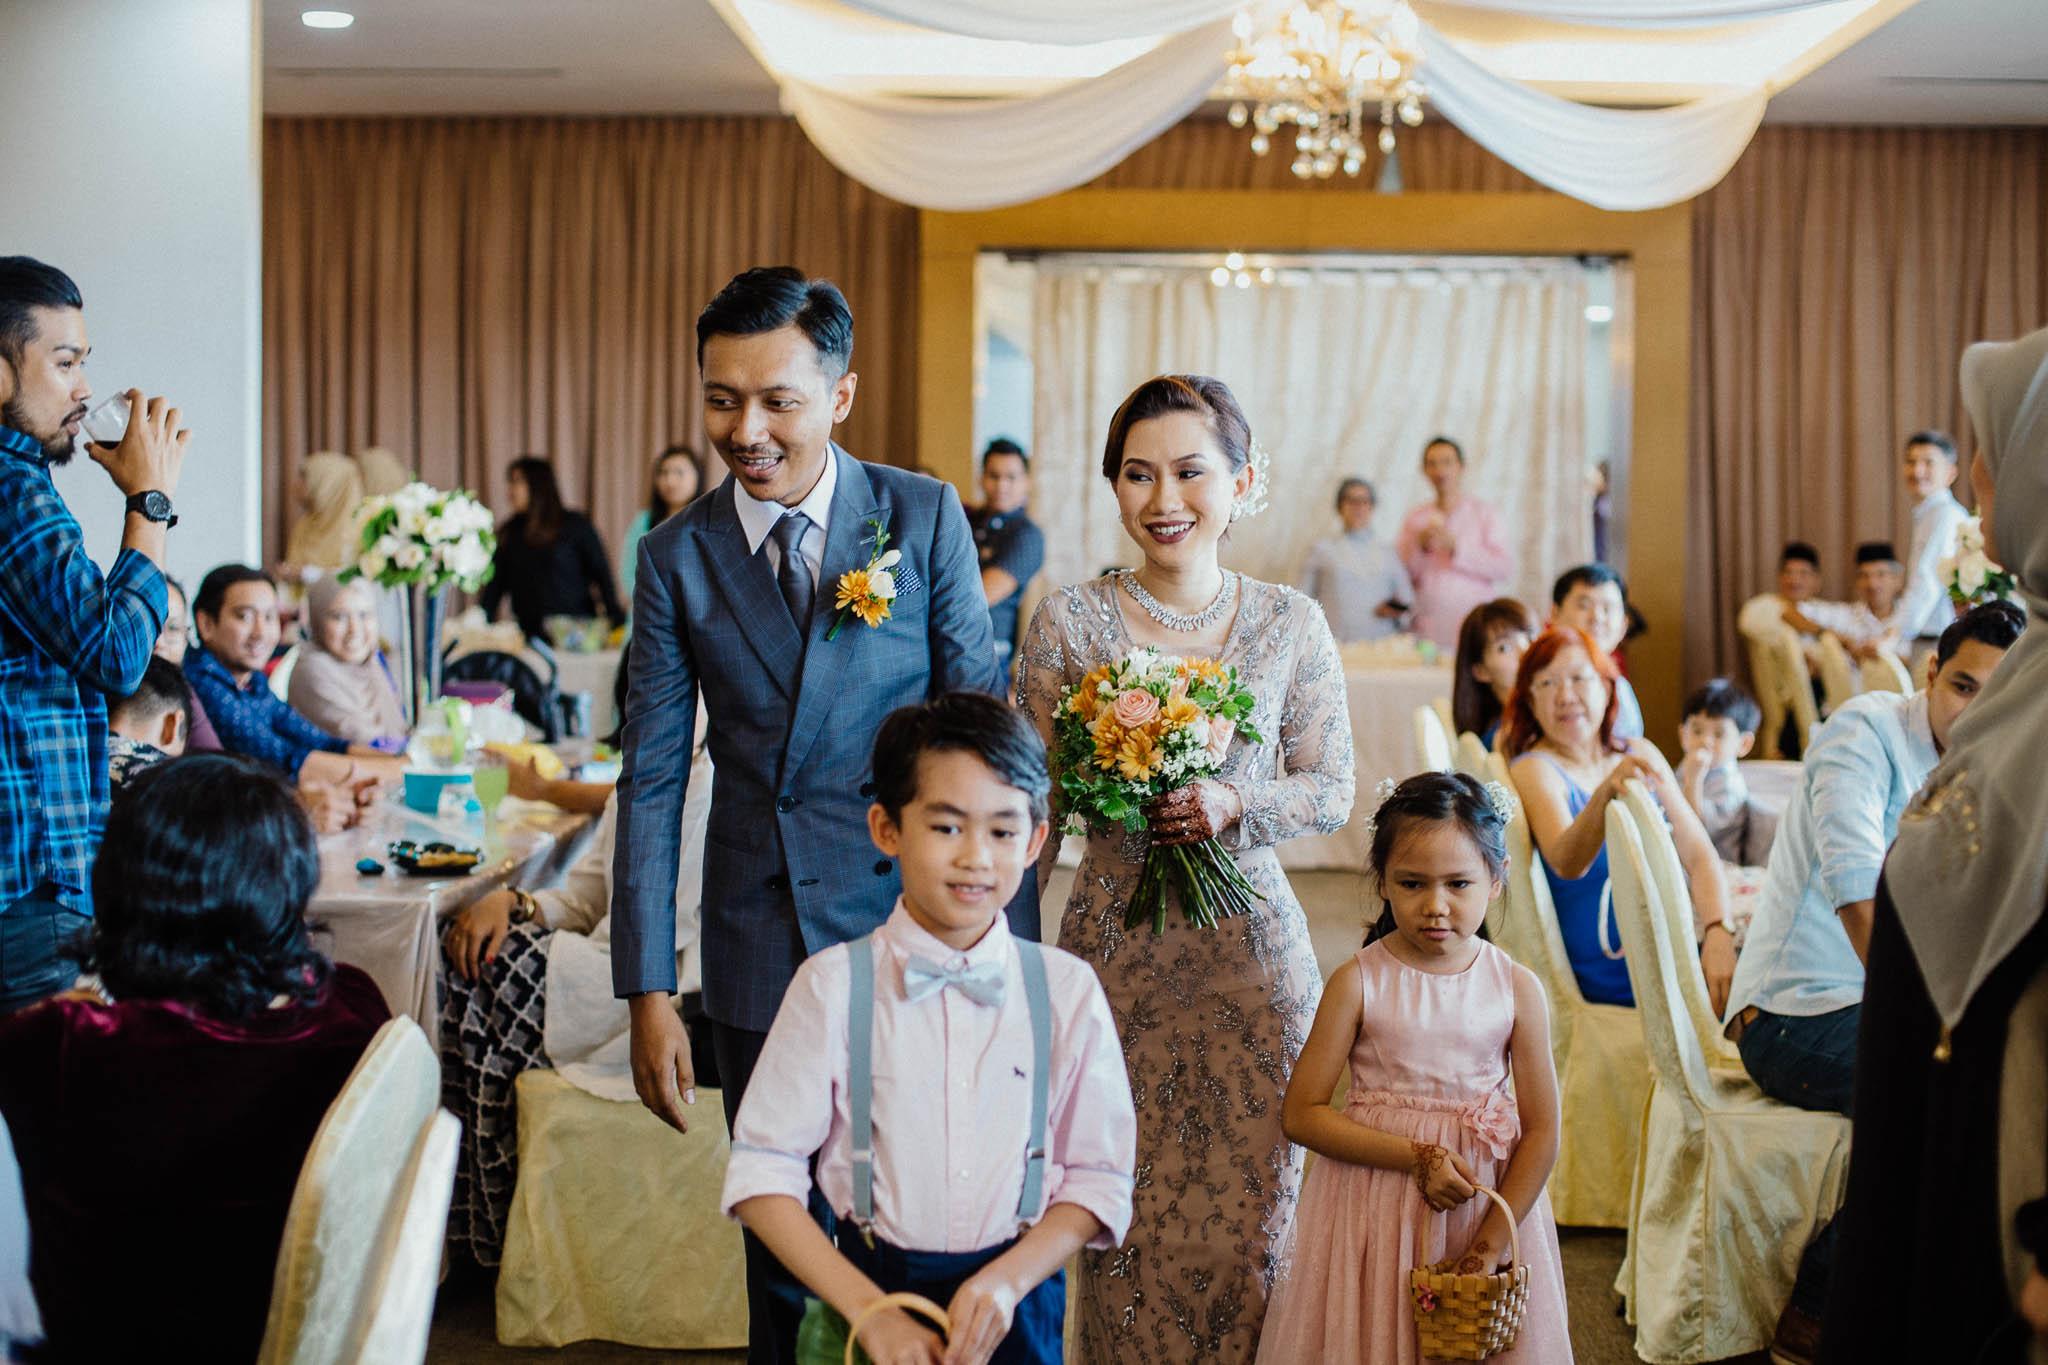 singapore-wedding-photographer-addafiq-nufail-048.jpg